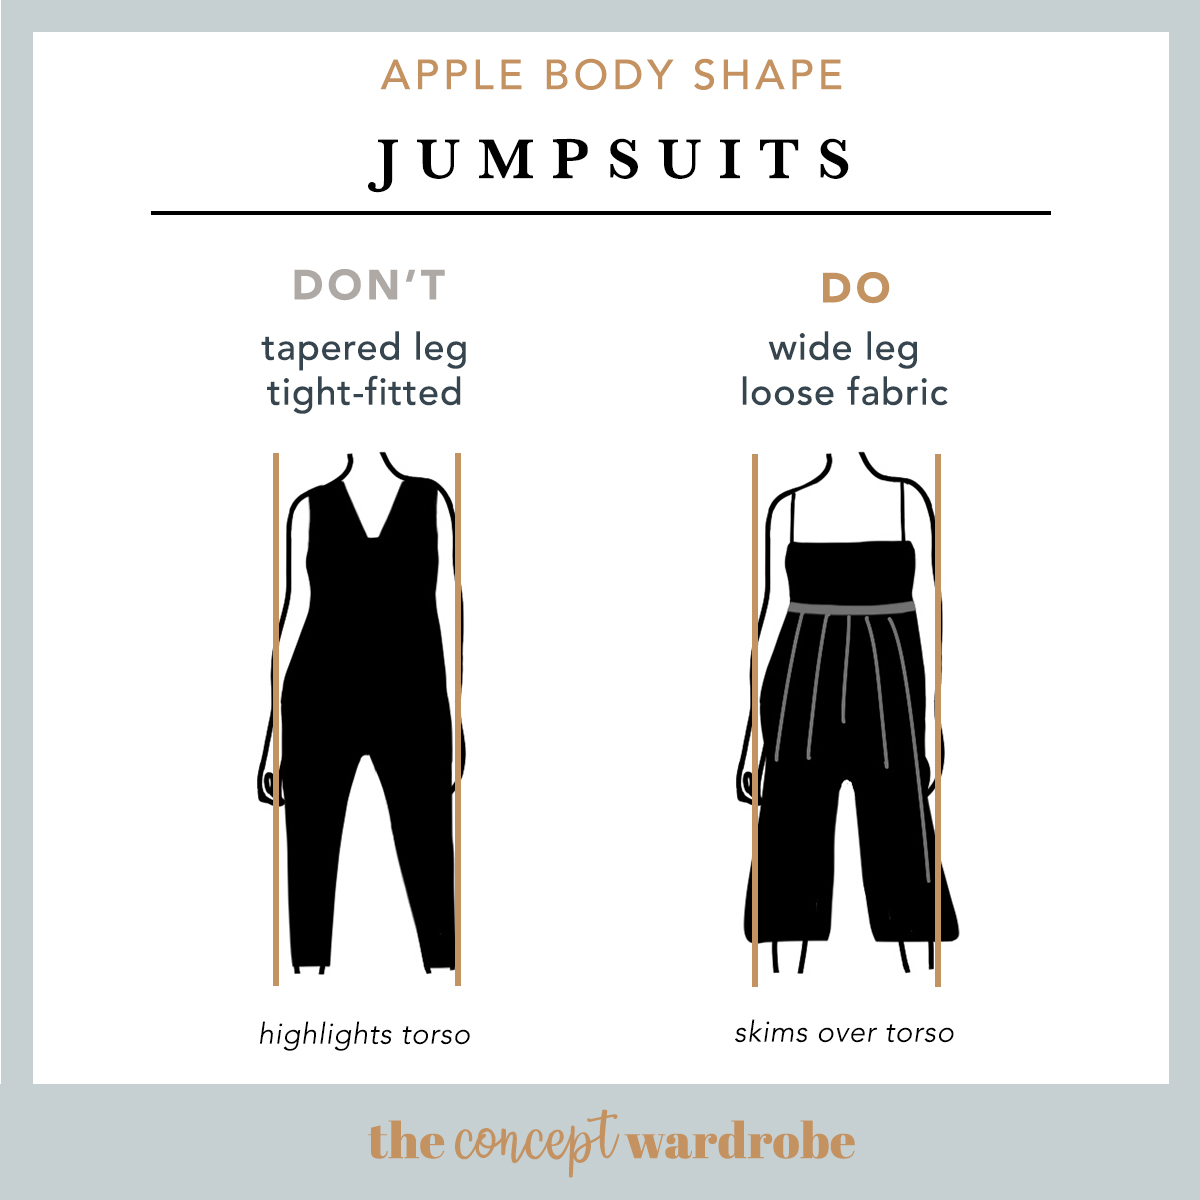 Apple Body Shape - Jumpsuits Do's & Don'ts